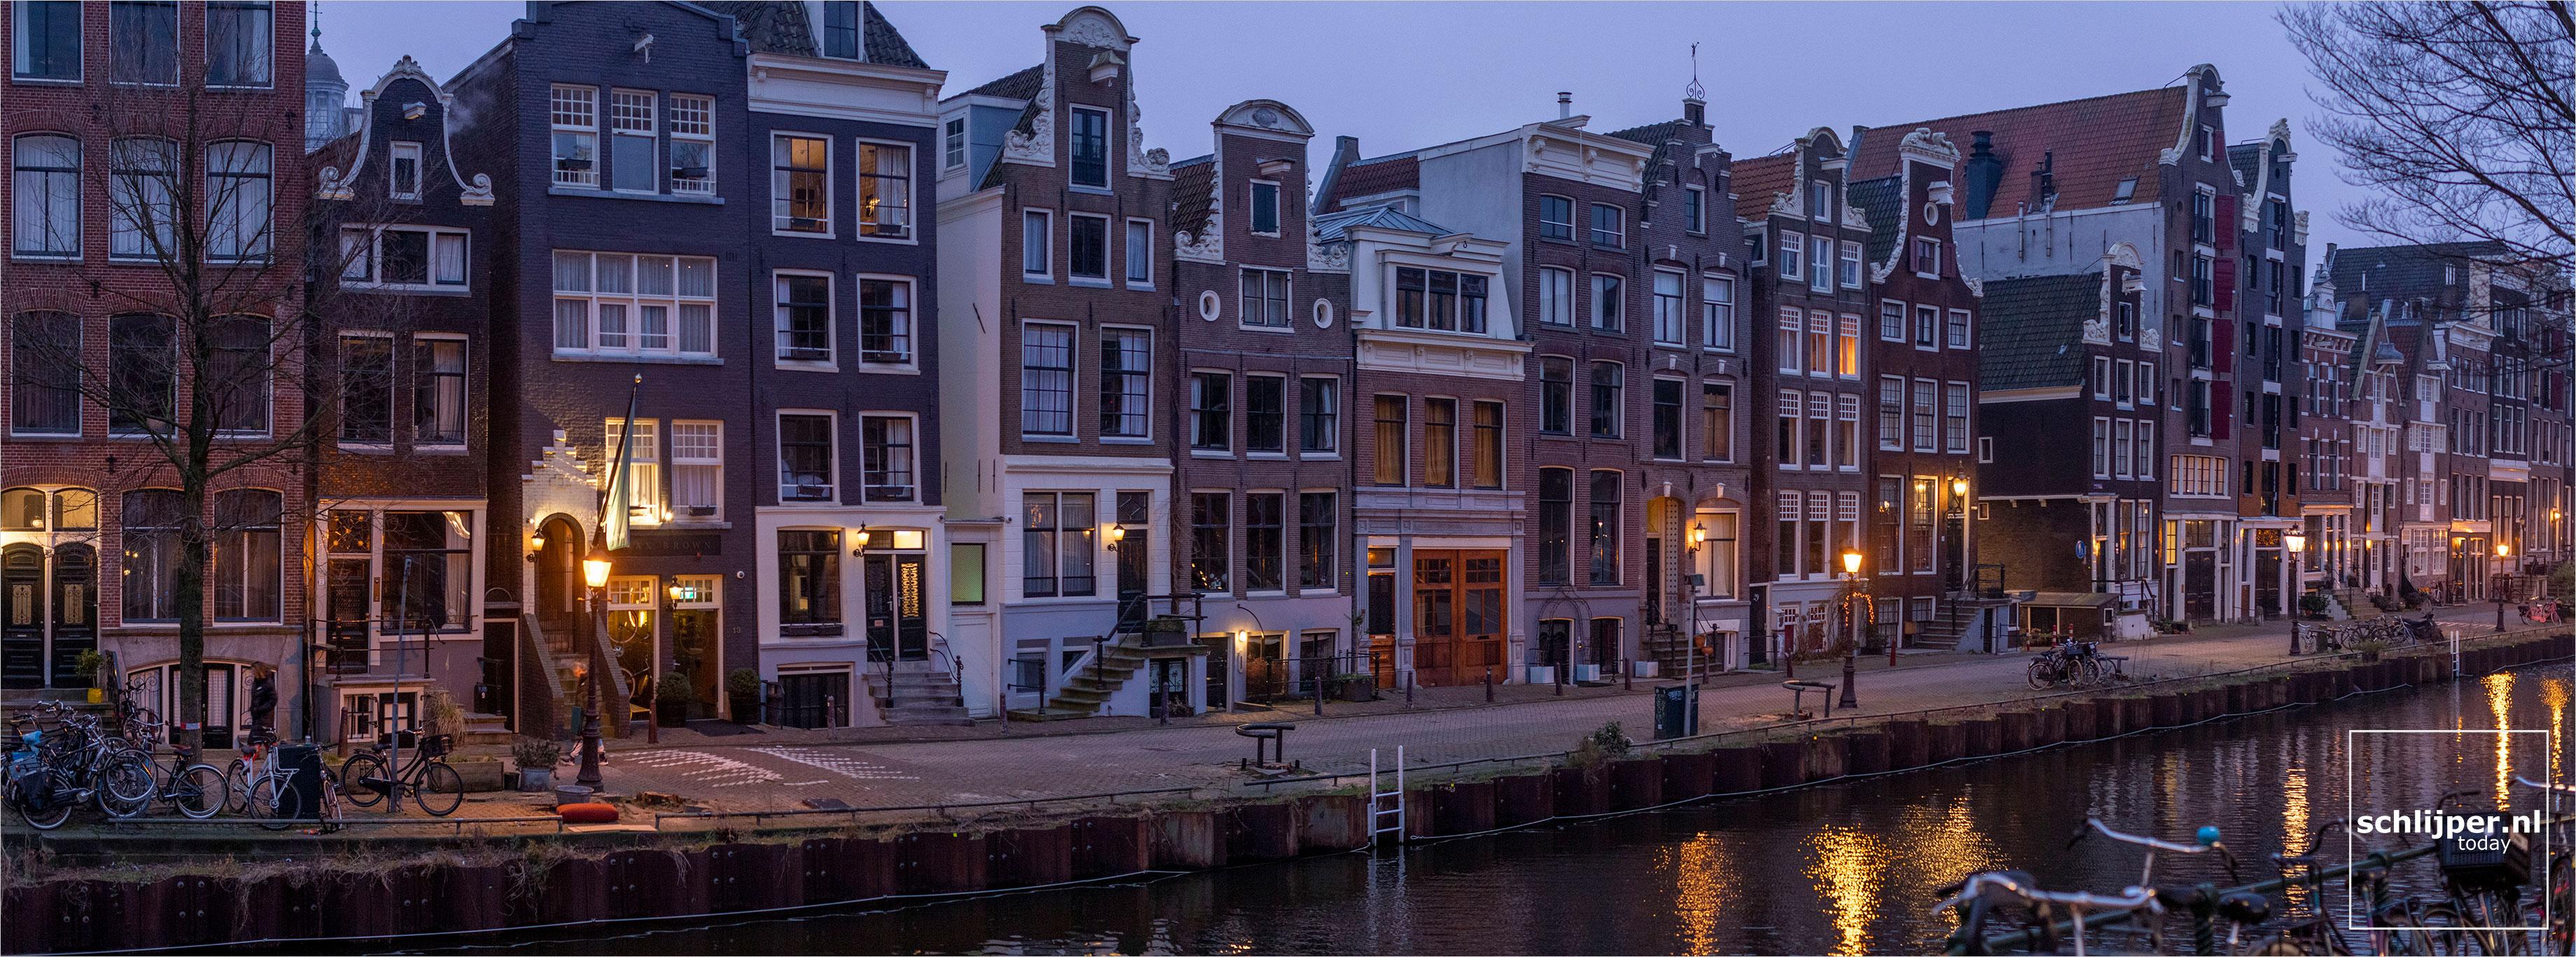 The Netherlands, Amsterdam, 1 maart 2021